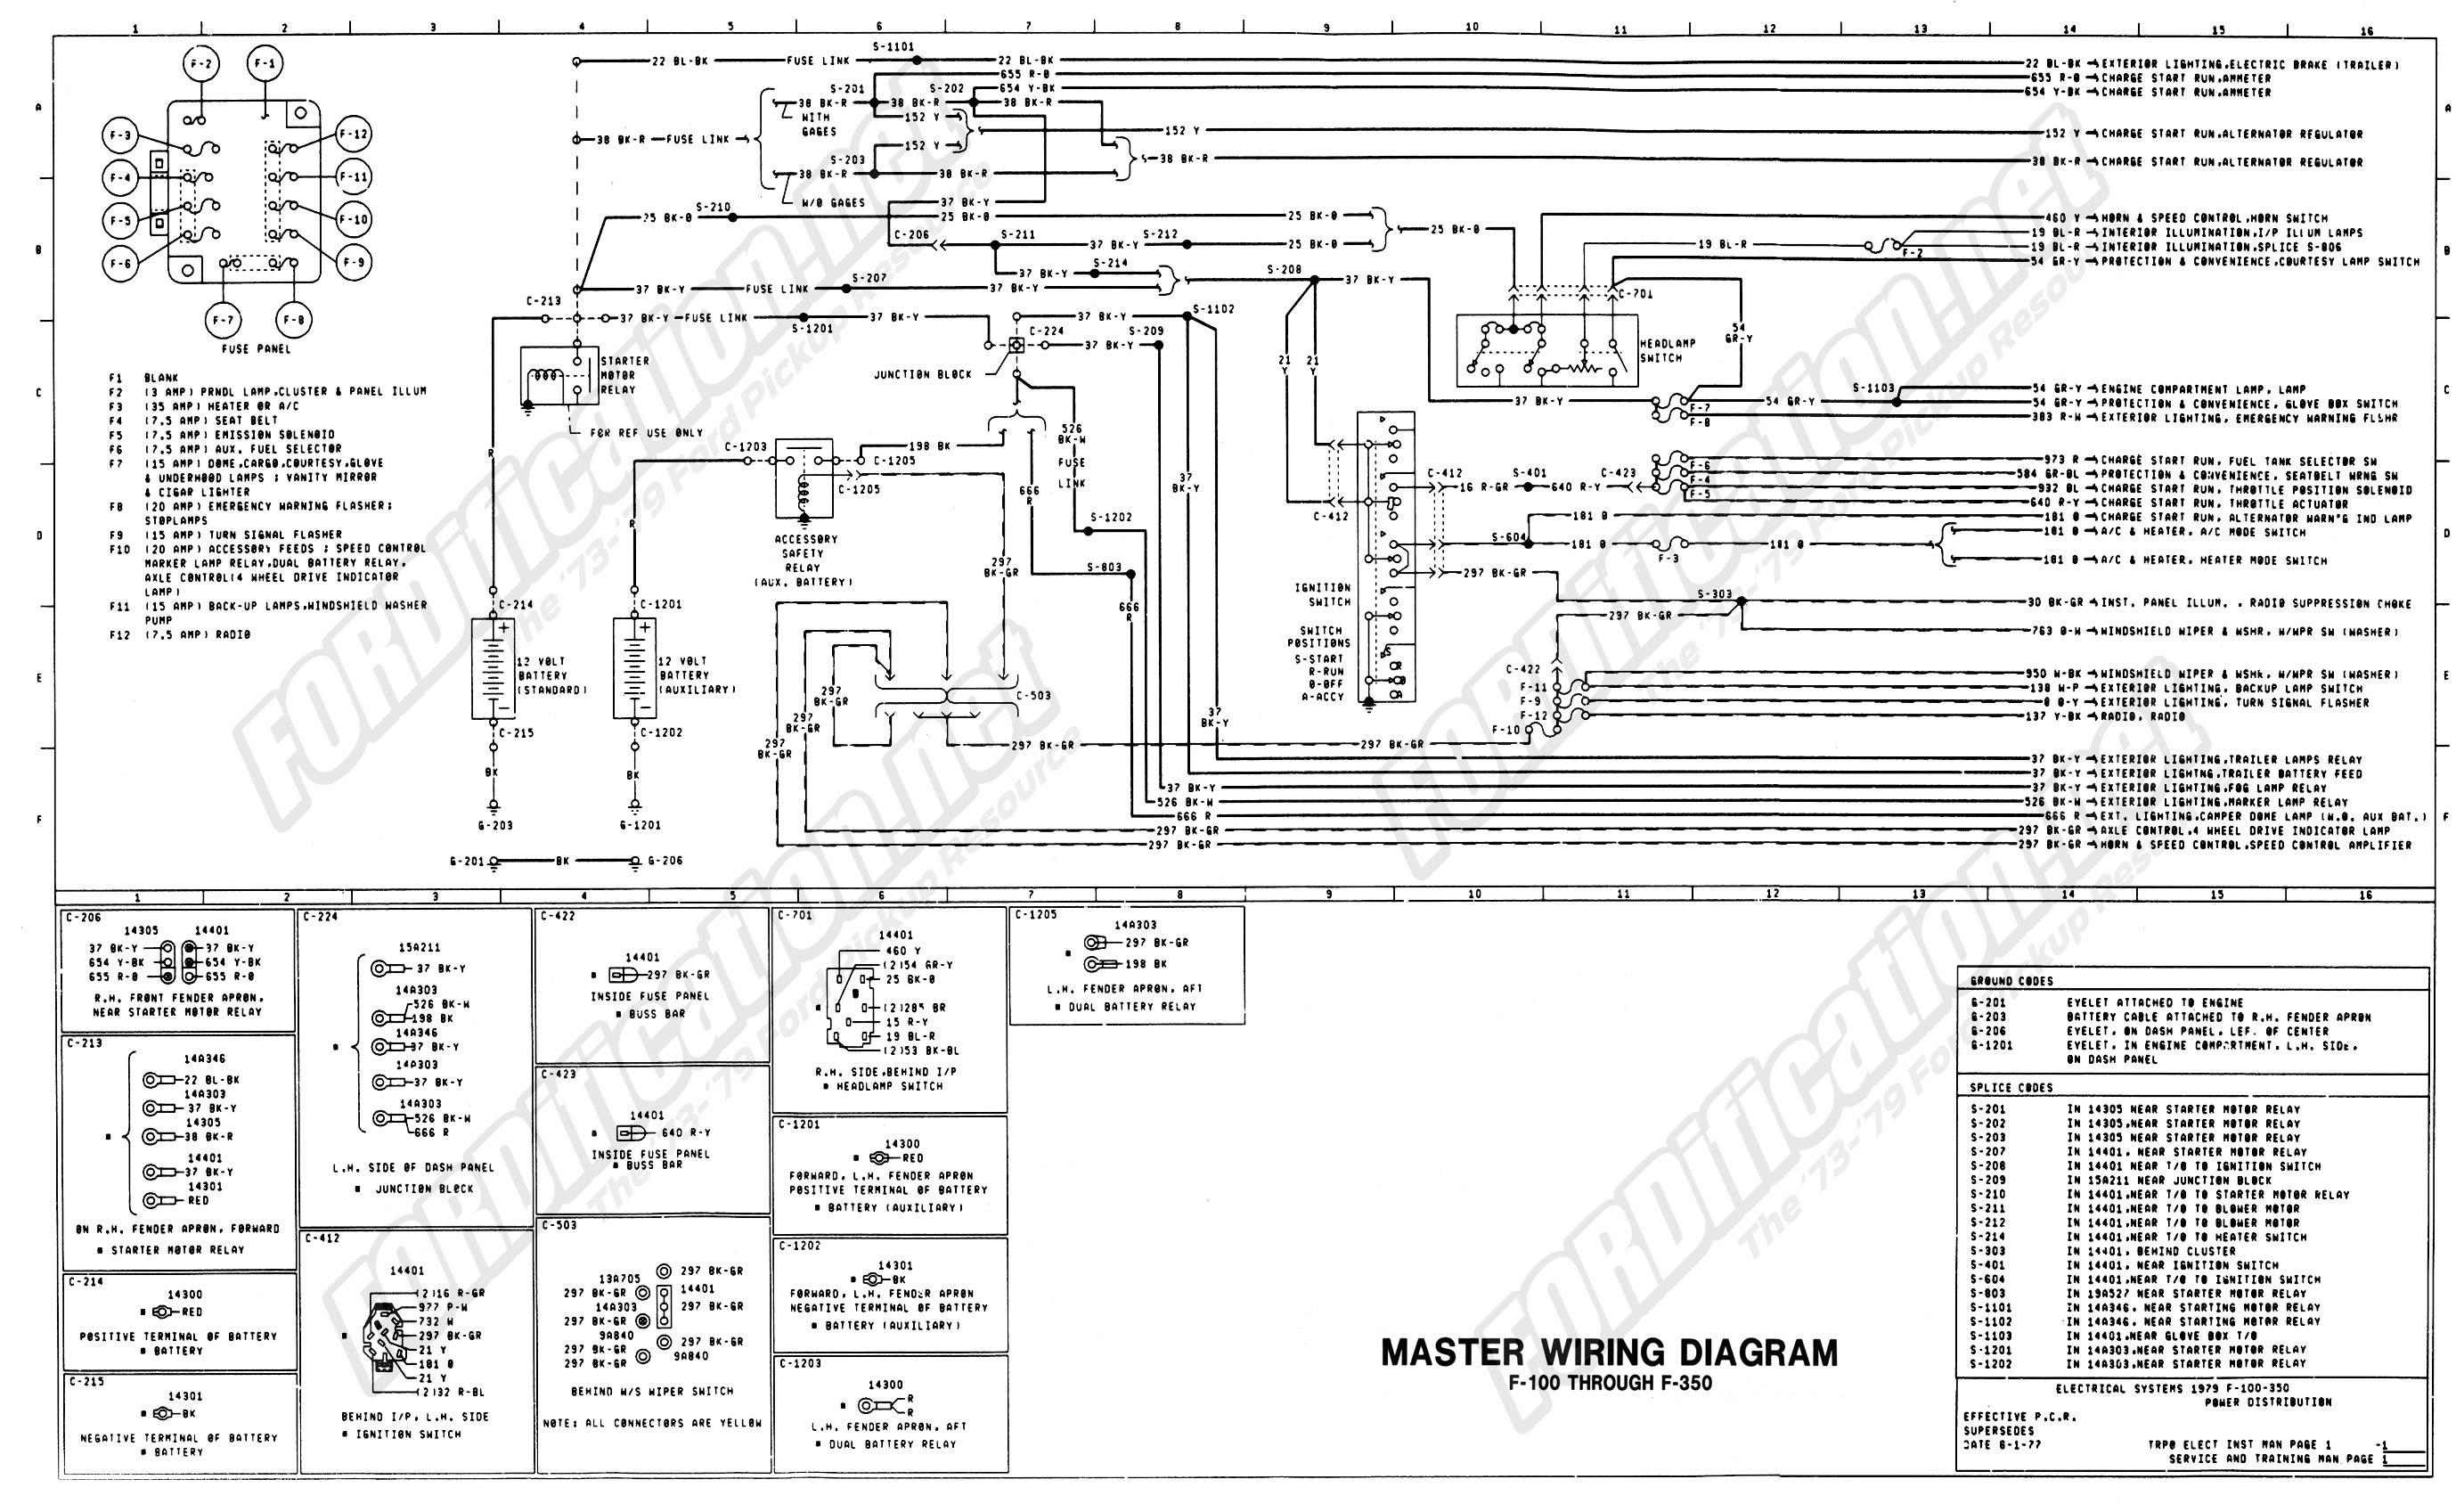 6.7 Powerstroke Wiring Diagrams Diagram] 1999 Sterling Fuse Diagram Full Version Hd Quality Of 6.7 Powerstroke Wiring Diagrams